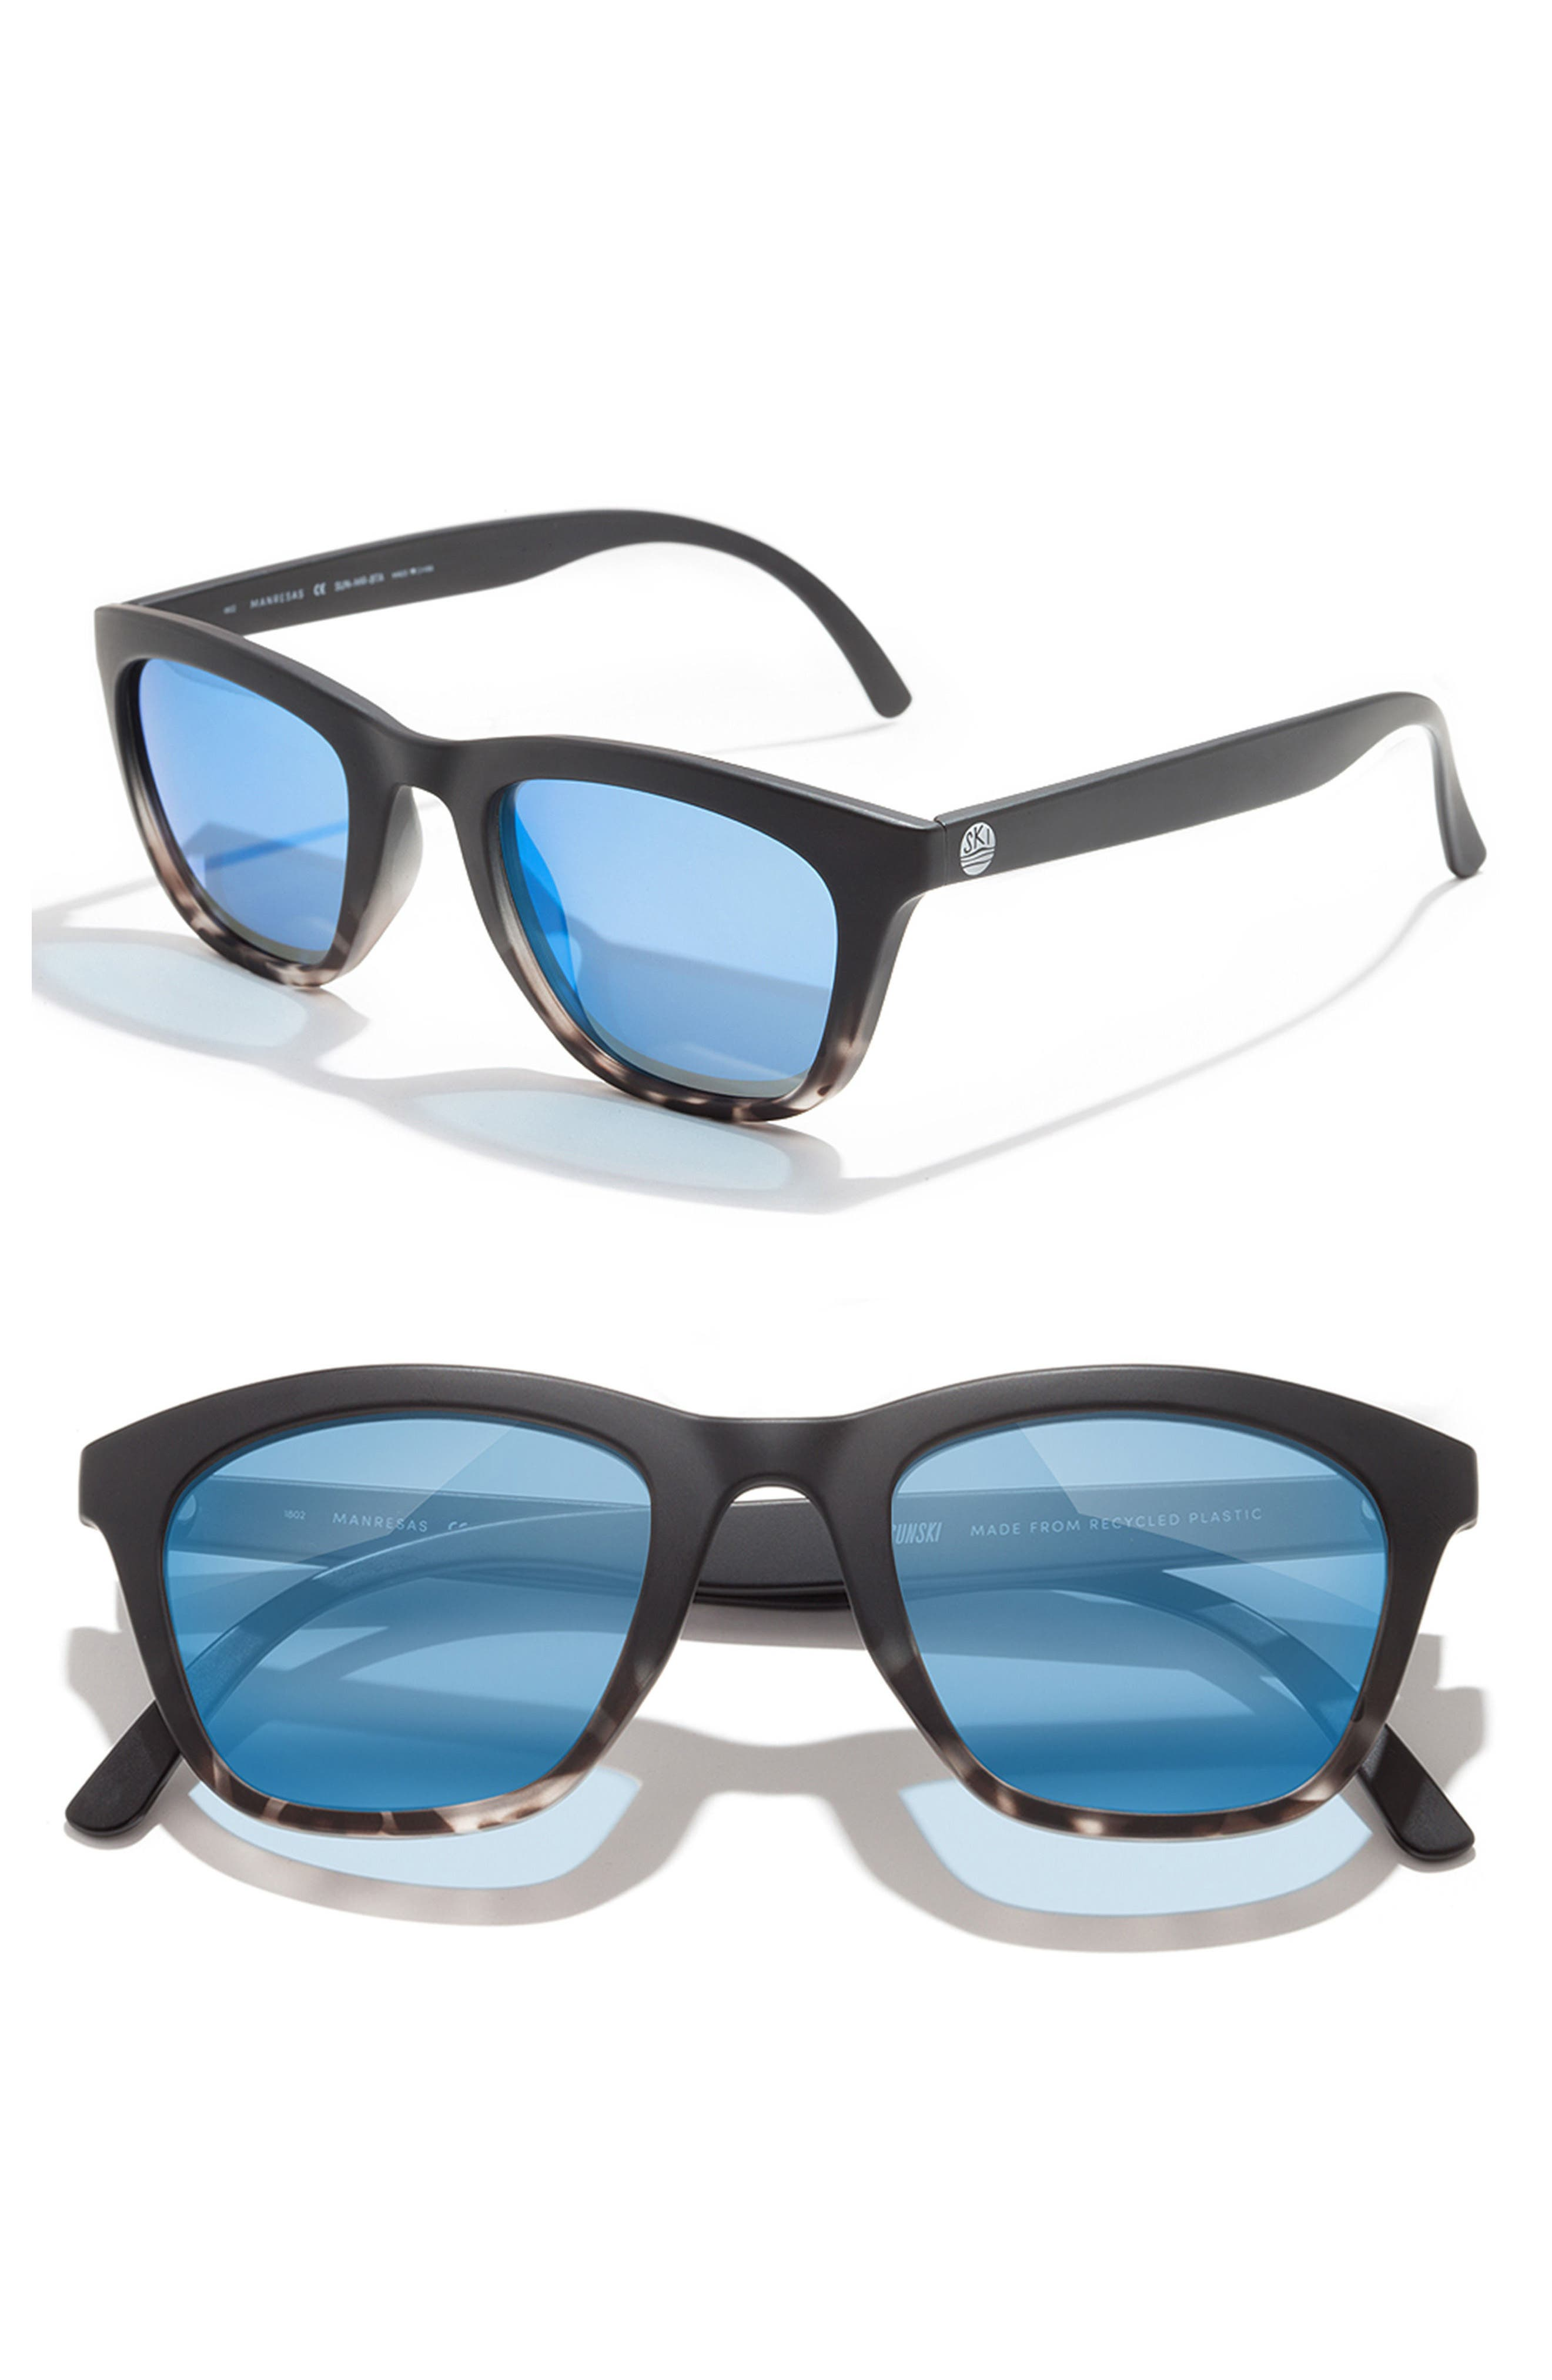 Manresa 49mm Polarized Sunglasses,                             Alternate thumbnail 2, color,                             BLACK TORTOISE SLATE